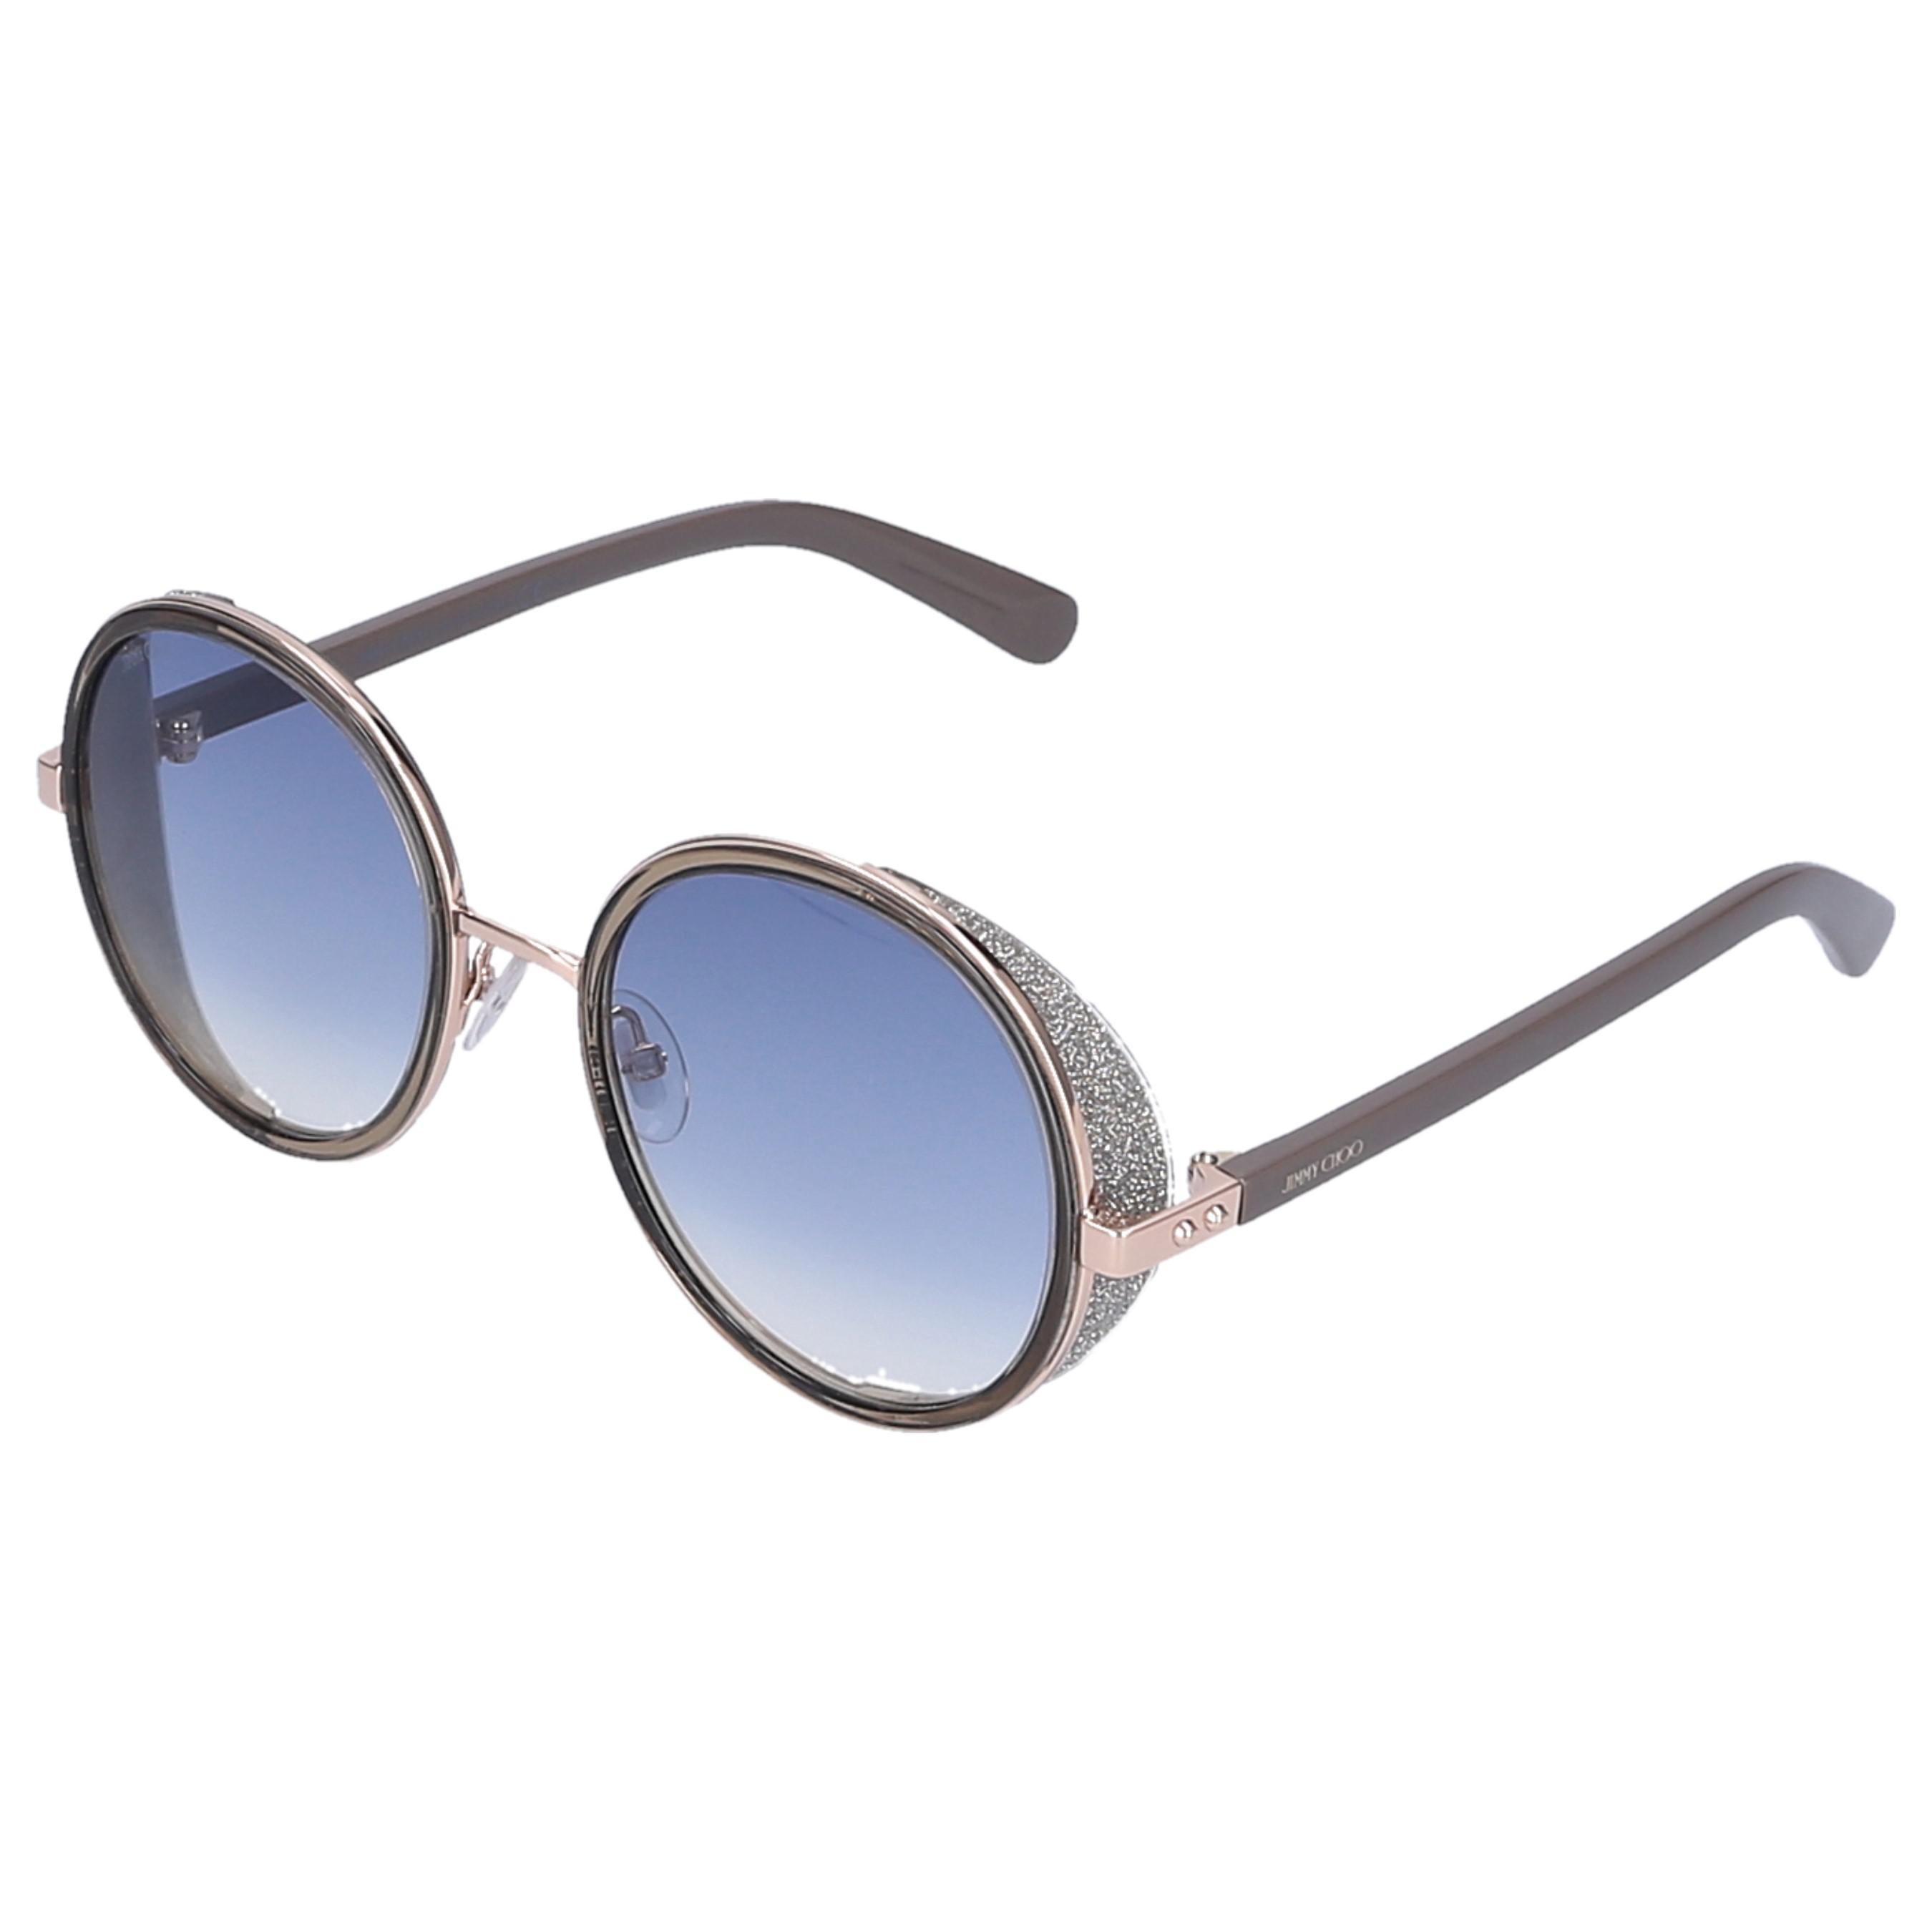 77ae63da0da Jimmy Choo - Multicolor Sunglasses Round Andie Metal Grey - Lyst. View  fullscreen